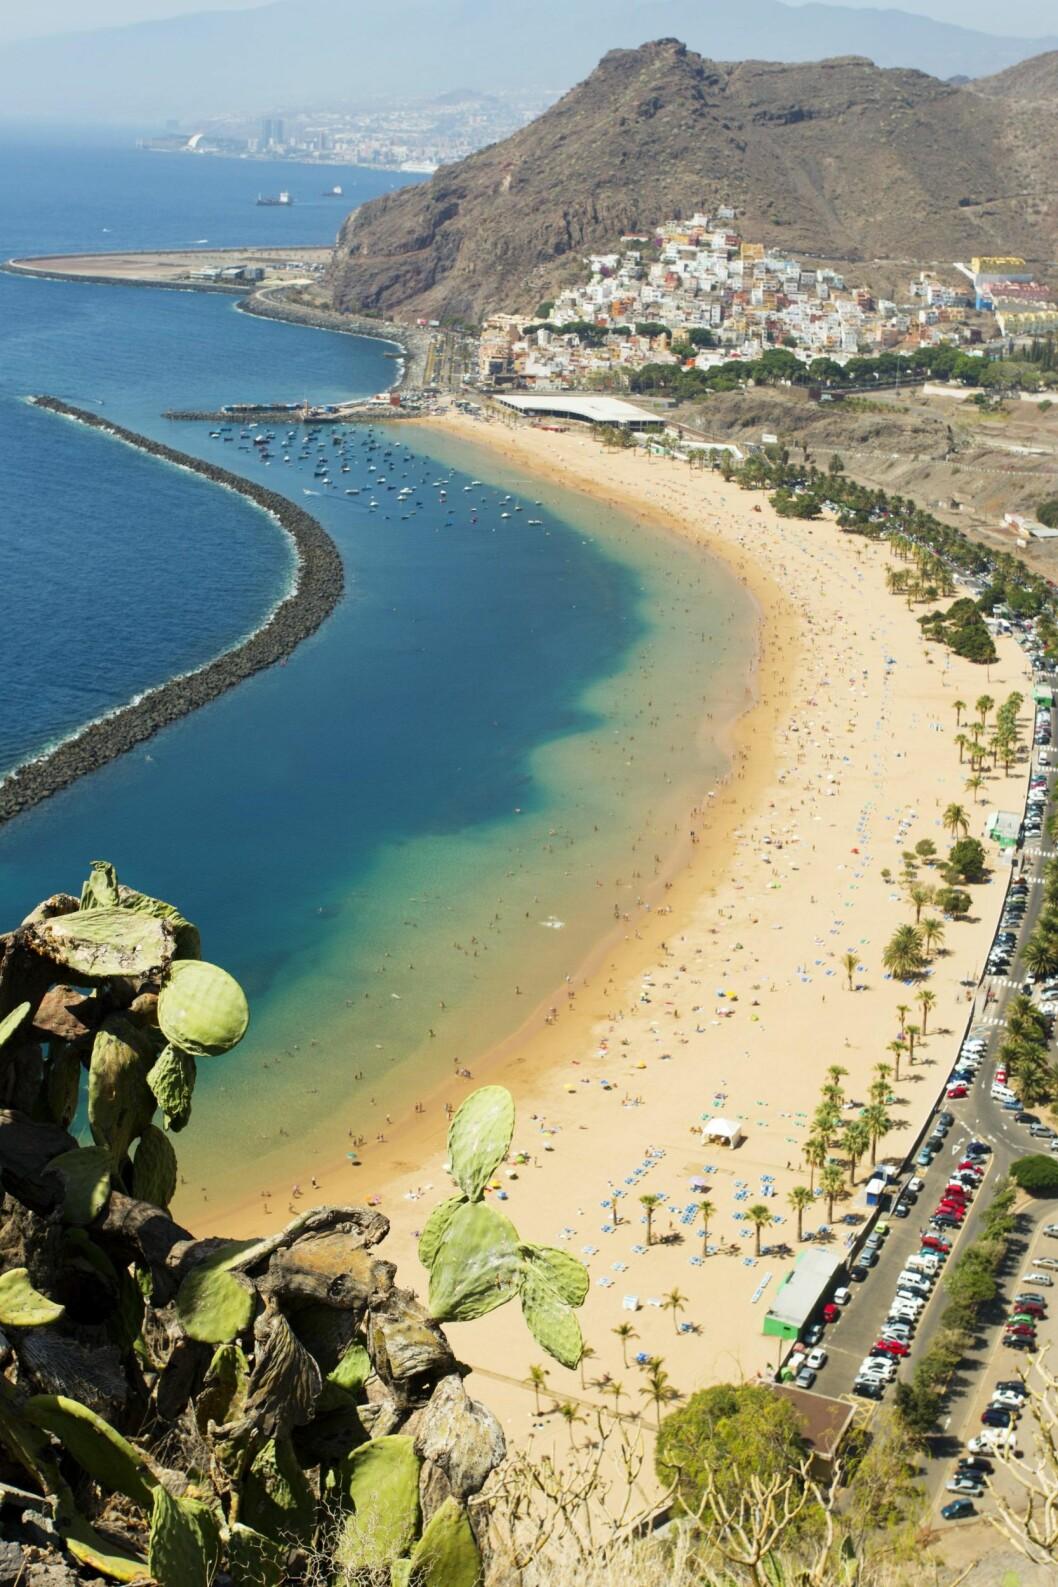 PERFEKT BYSTRAND: Riktignok ligger Las Teresitas-stranden litt utenfor Tenerifes hovedstad Santa Cruz, men det tar bare ti minutter hit med buss eller taxi. Foto: Oddvar Walle Jensen